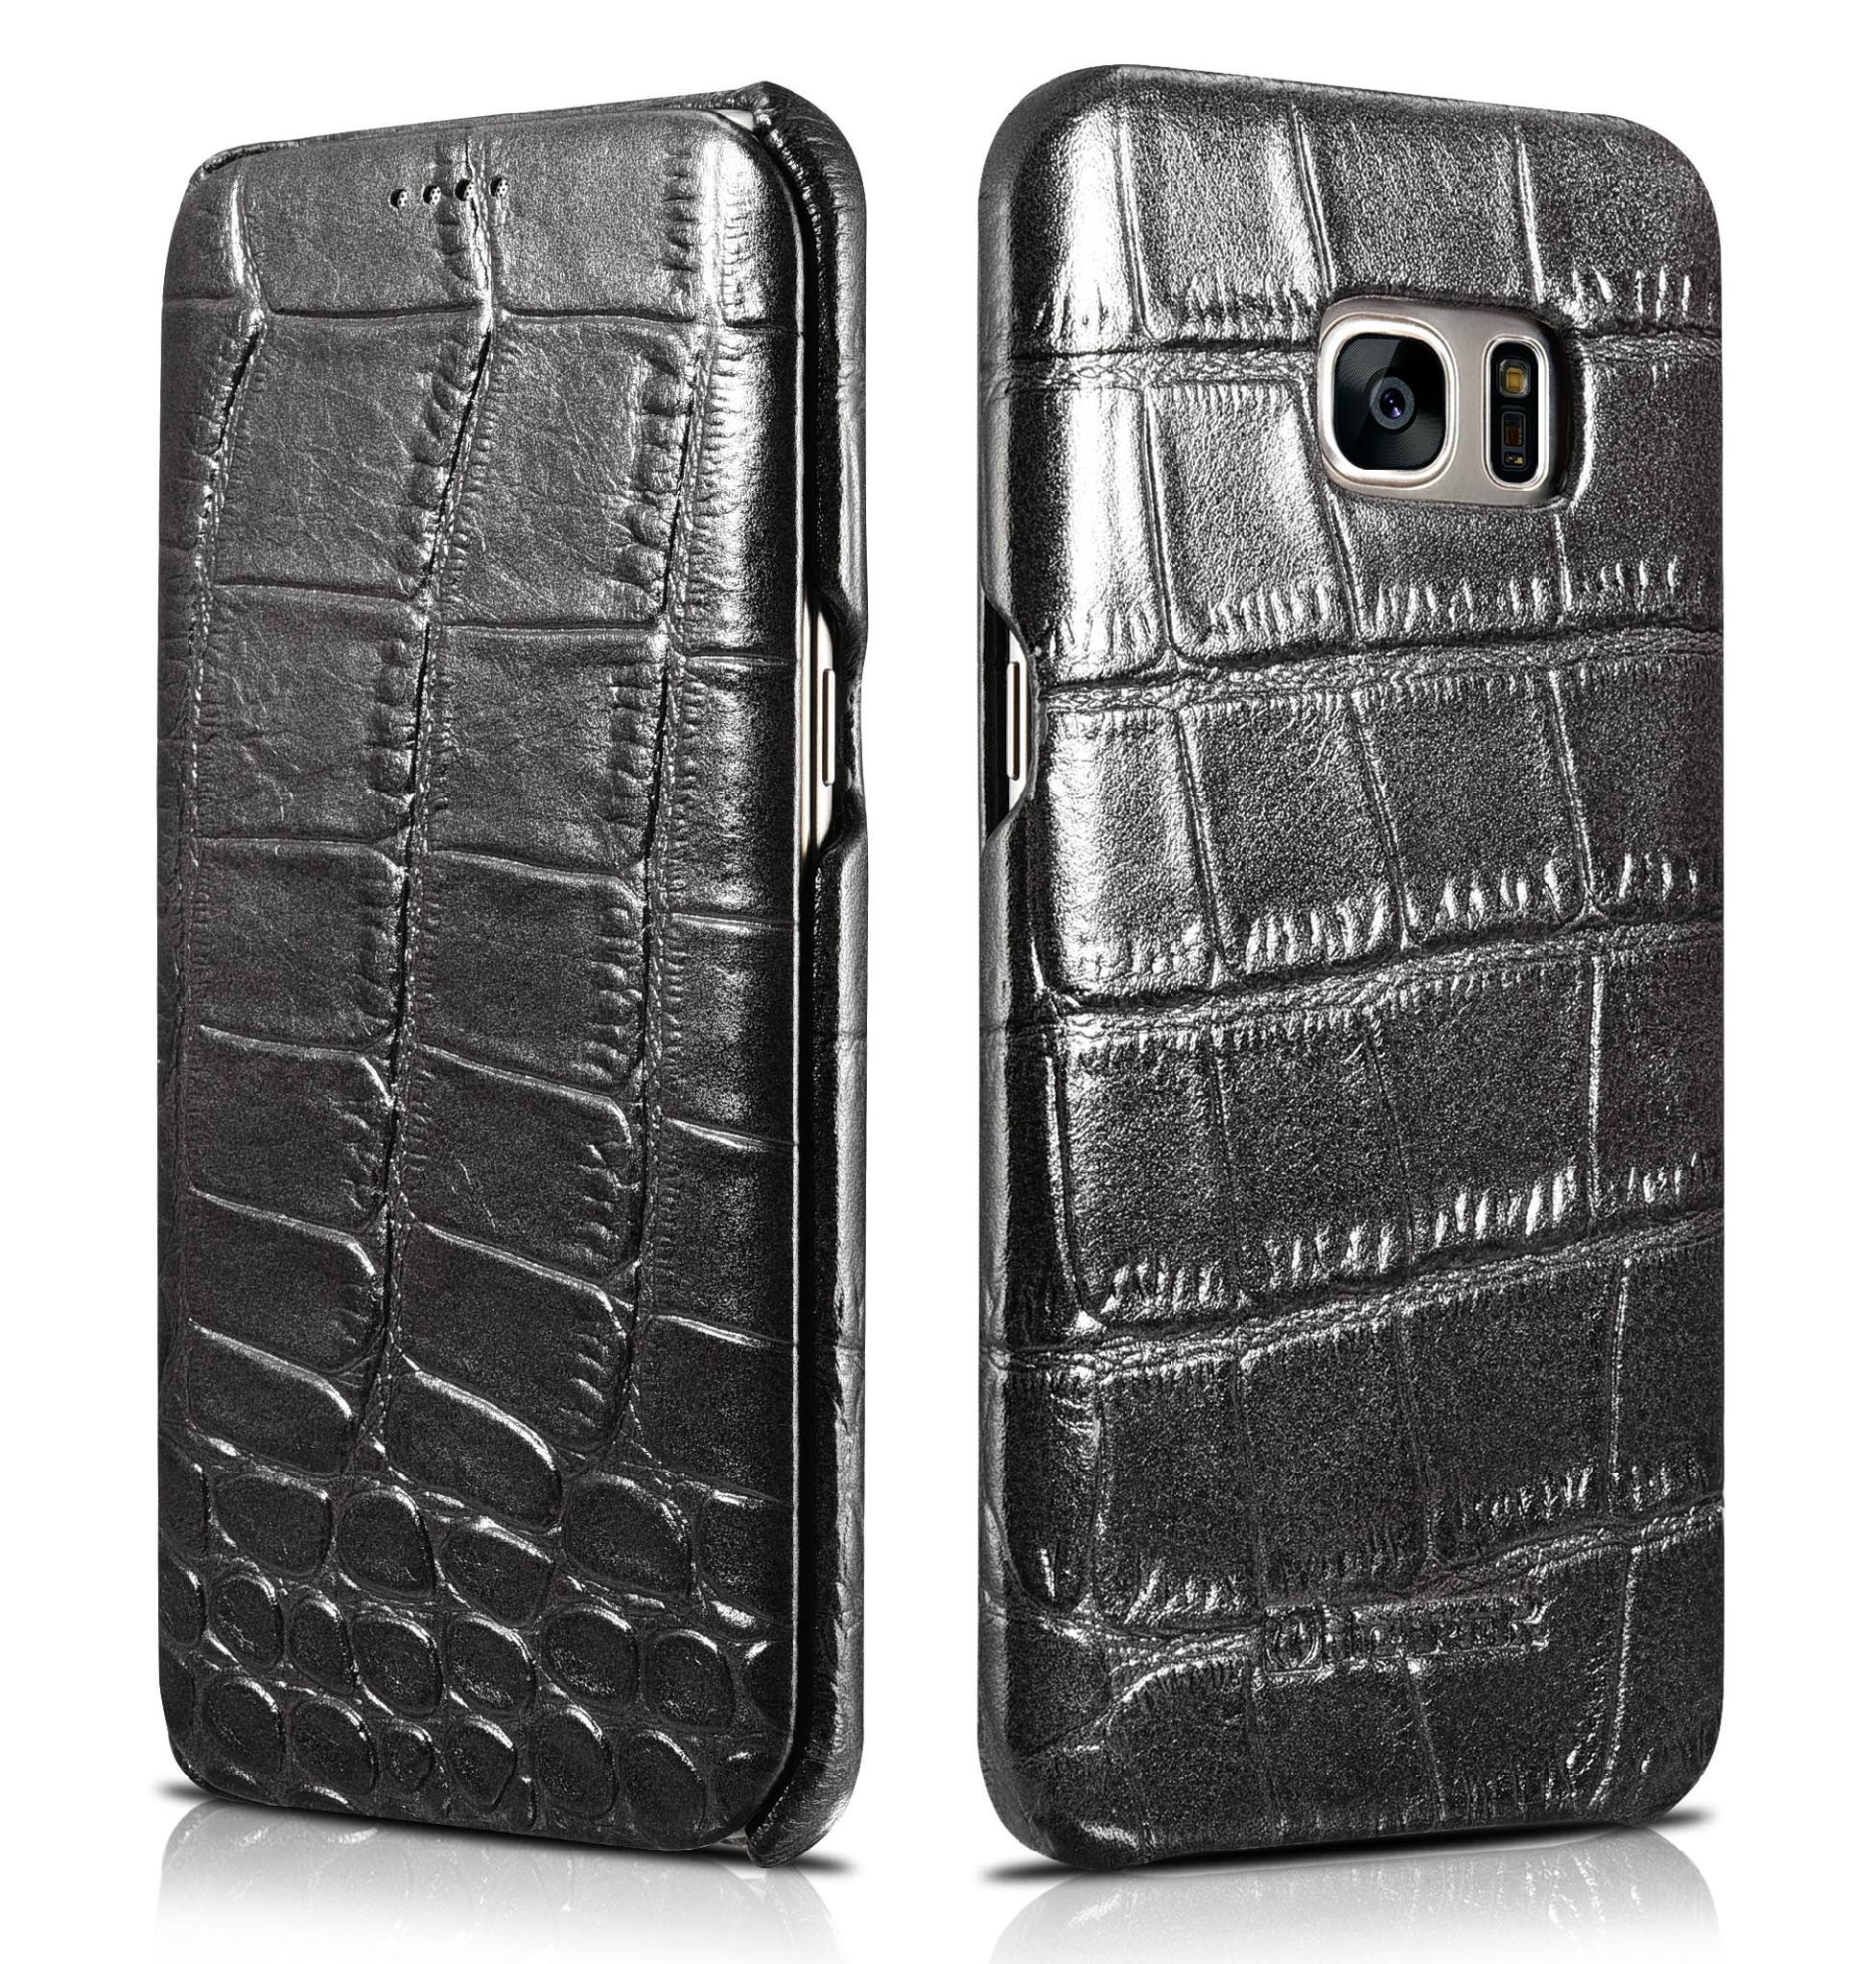 iCarer Samsung Galaxy S7 Edge Embossed Crocodile Genuine Leather Folio Case 1